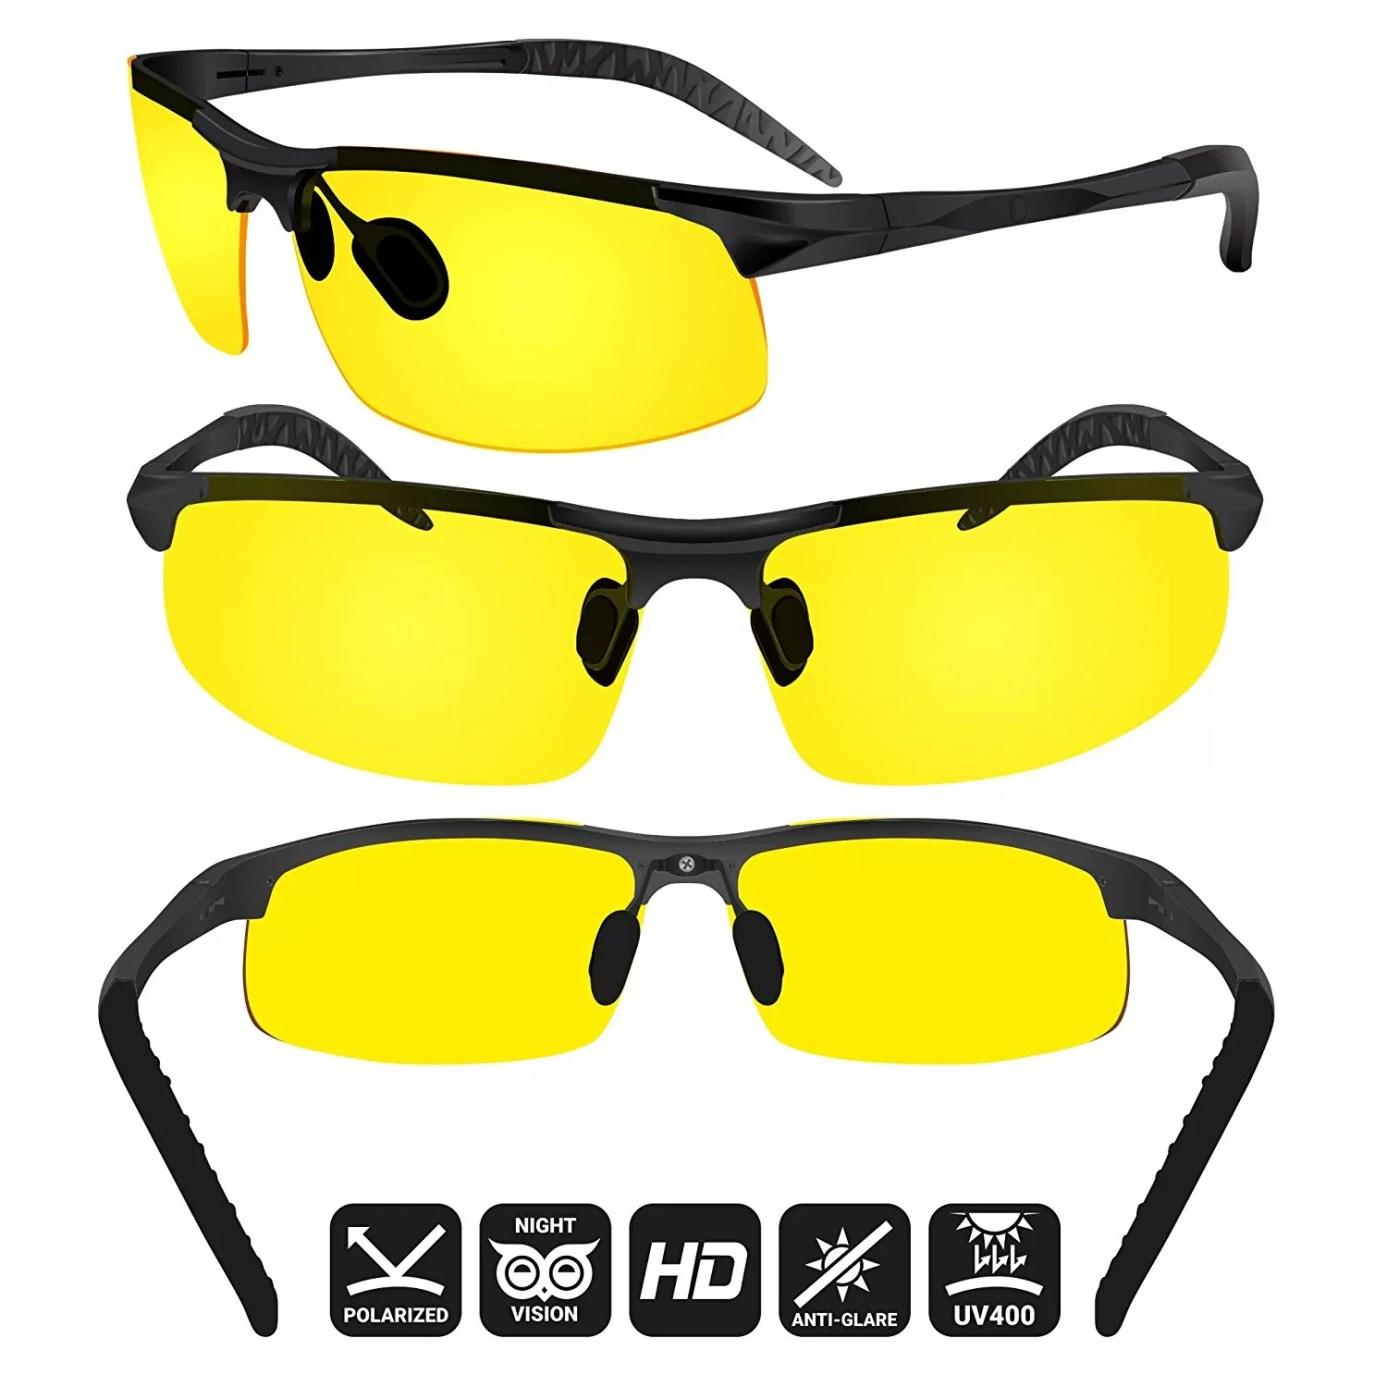 fee84874cfd BLUPOND Night-Sight Driving Glasses - Anti-Glare HD Vision ...